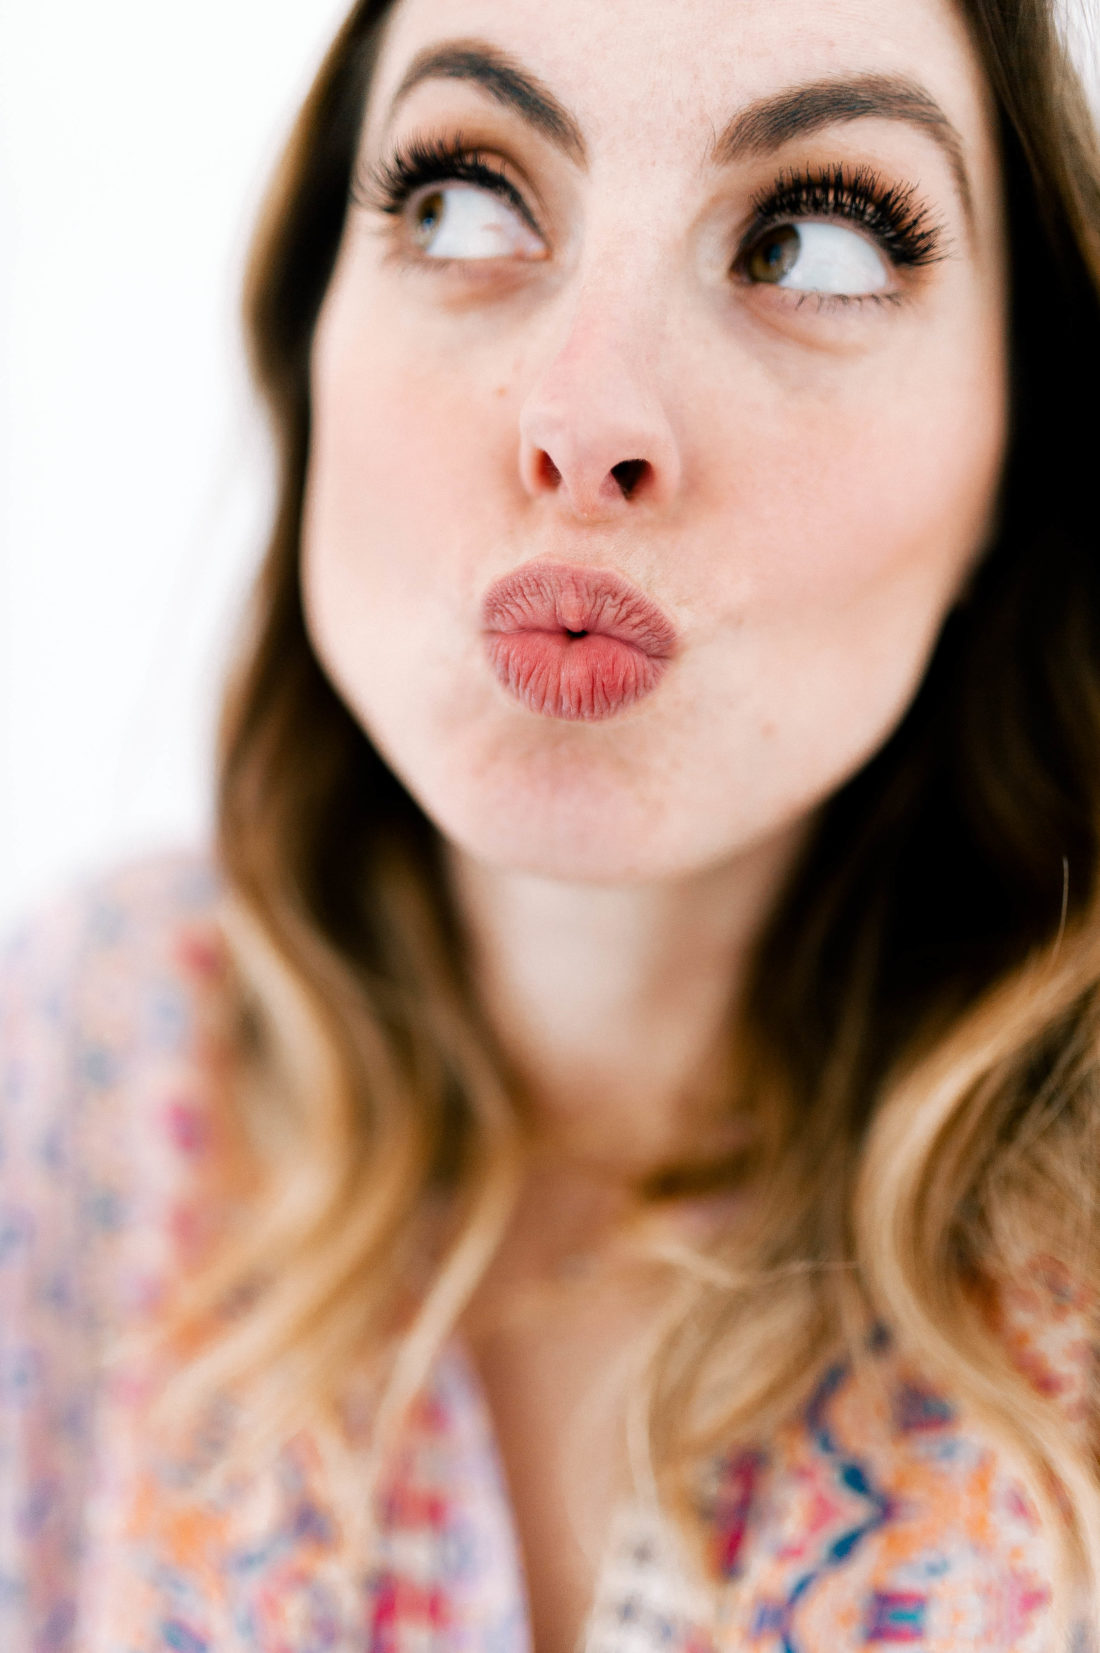 Eva Amurri Martino shows her dry lips before applying a rose moisturizing lip mask